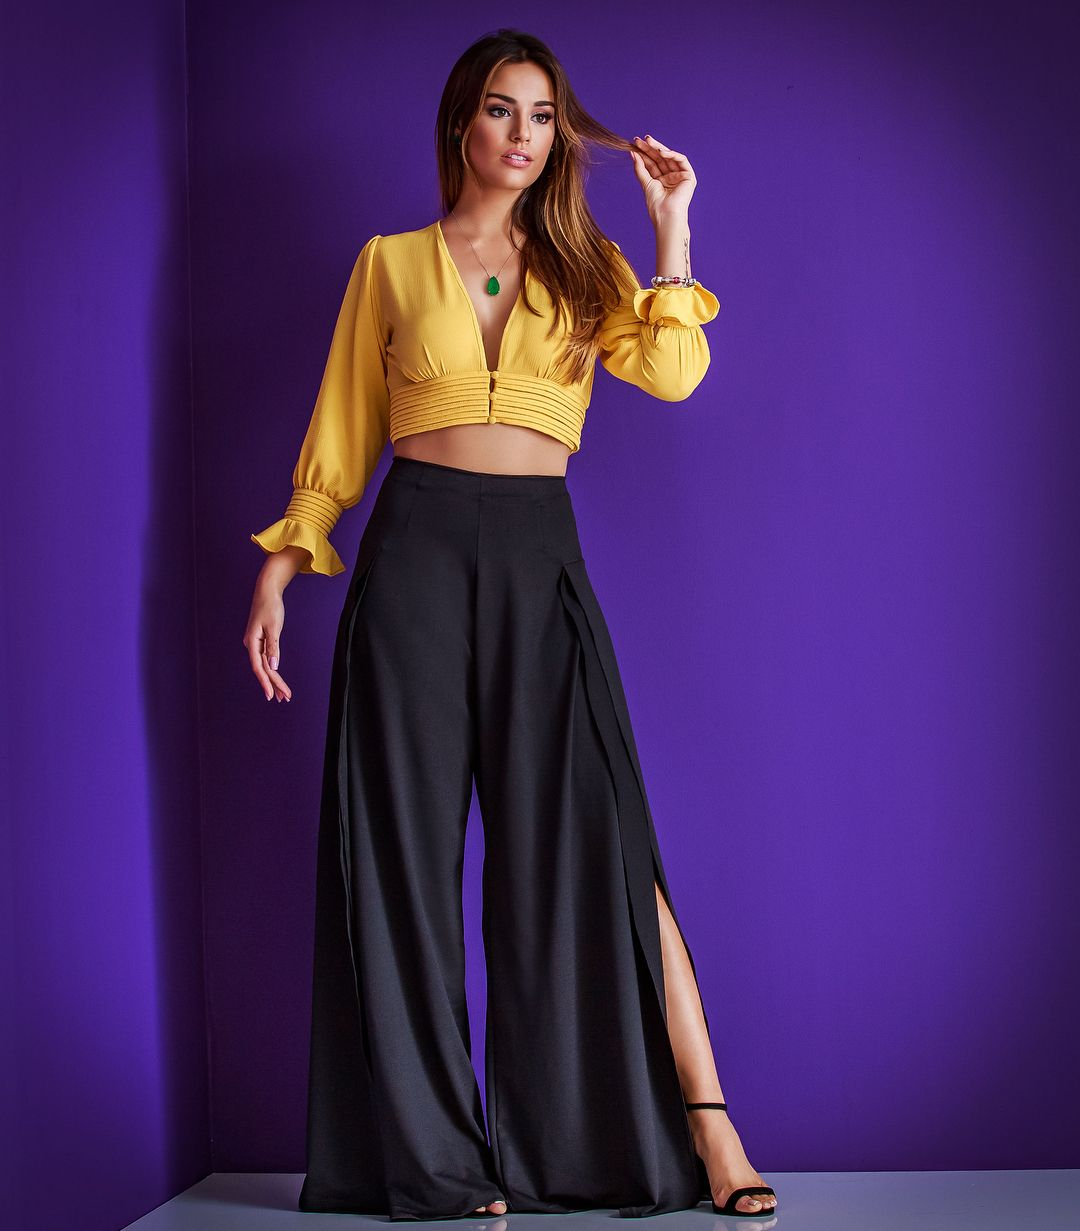 Cauti Cizme dama Caleruela Roz ? Descopera Oferta - Fashion boldcharts.ro